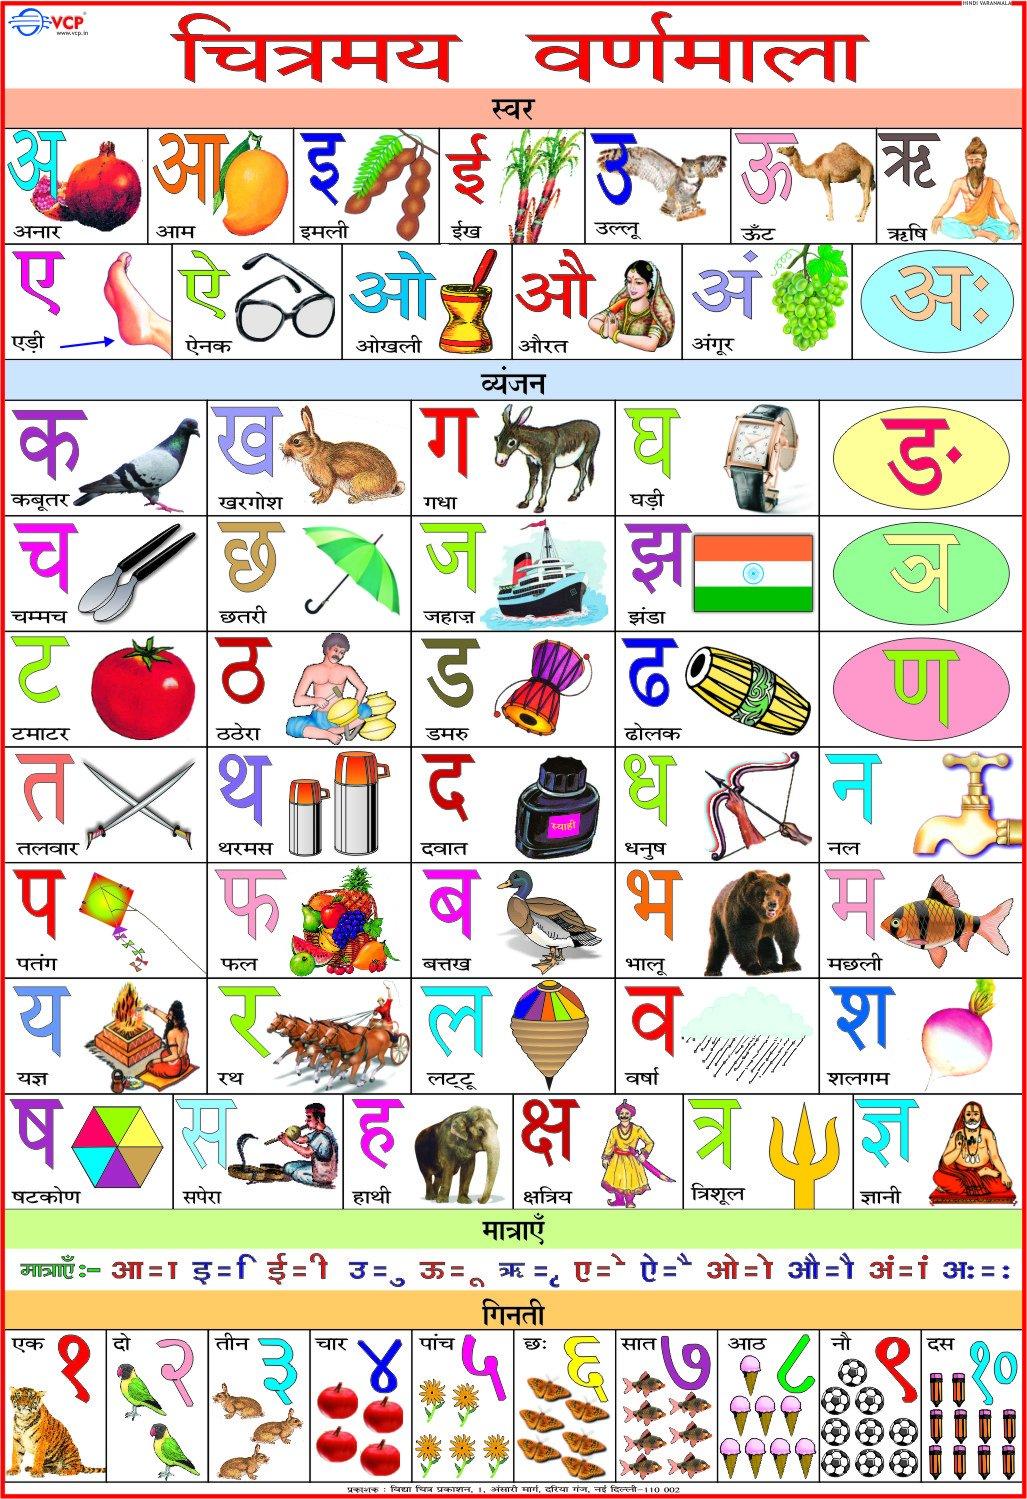 Amazon.in: Buy Alphabet Hindi Chart ( 70 x 100 cm ) Book Online at ...